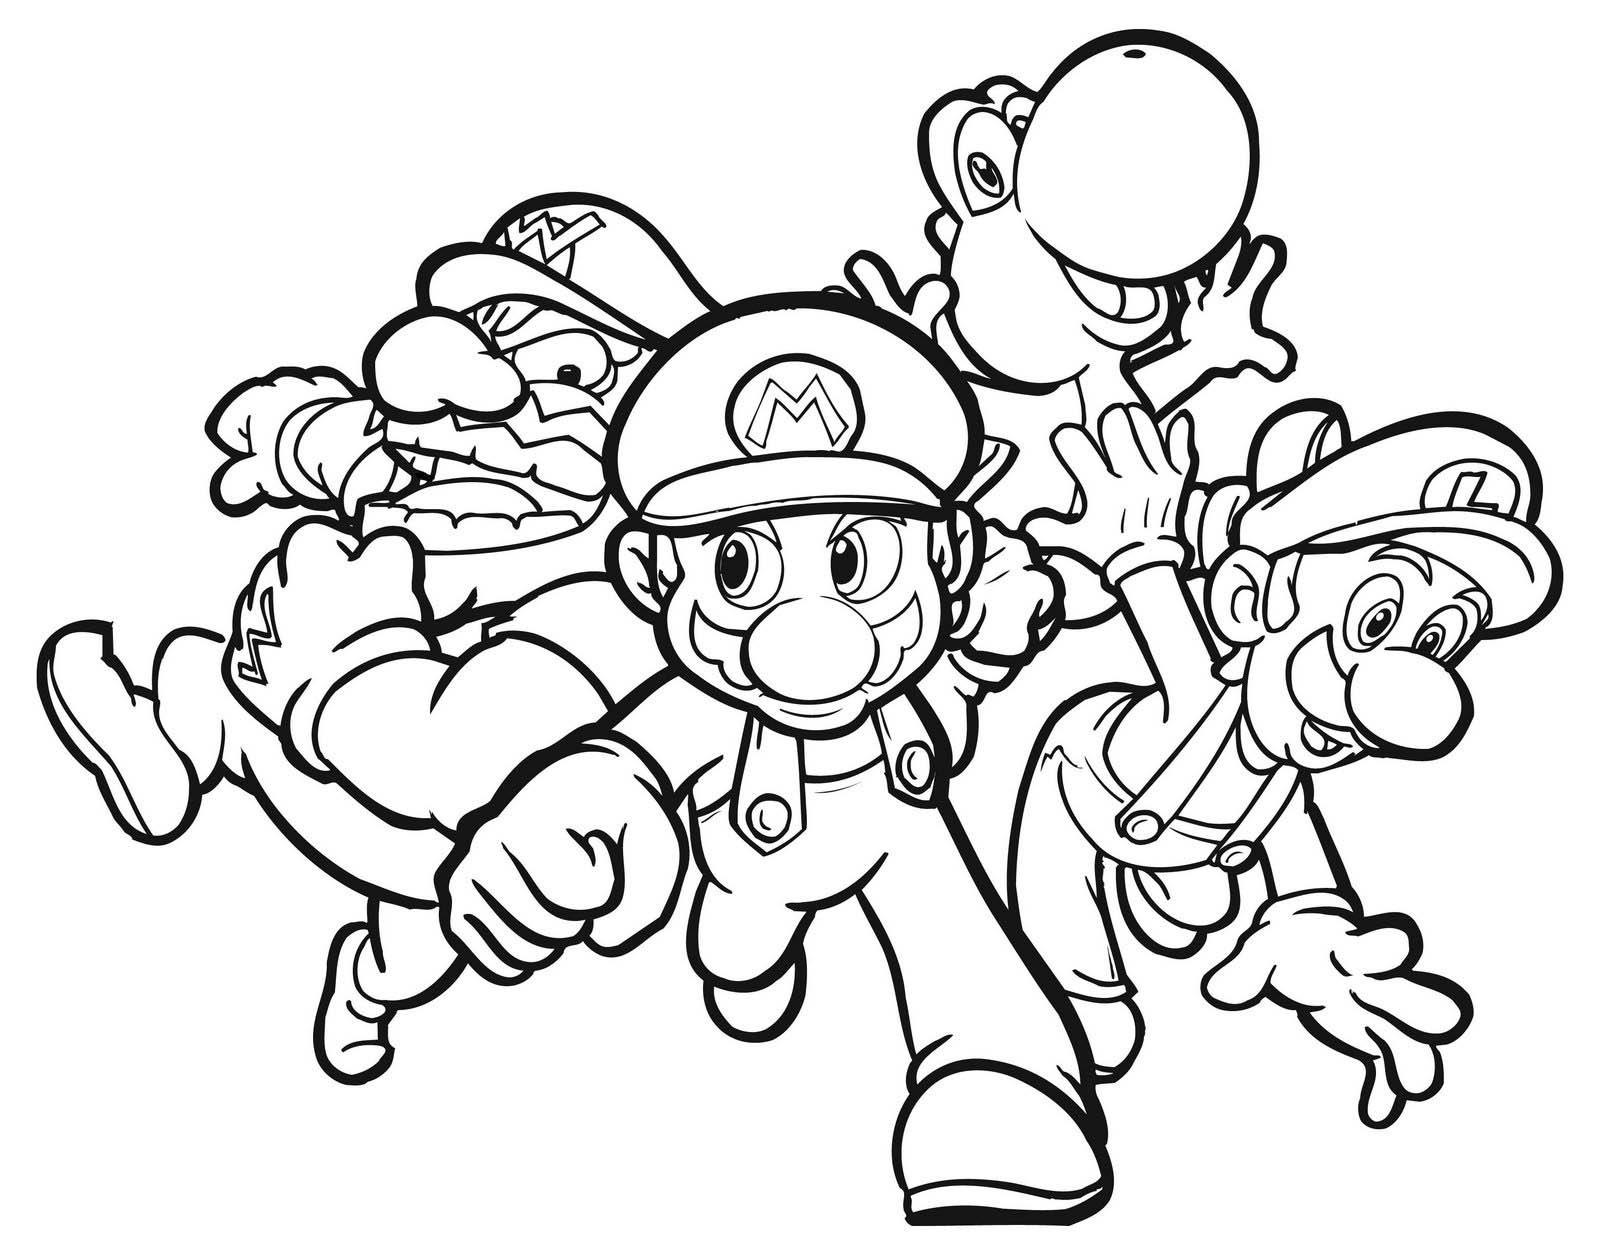 Uncategorized Super Smash Bros Brawl Coloring Pages super smash bros brawl colouring pages coloring page home page